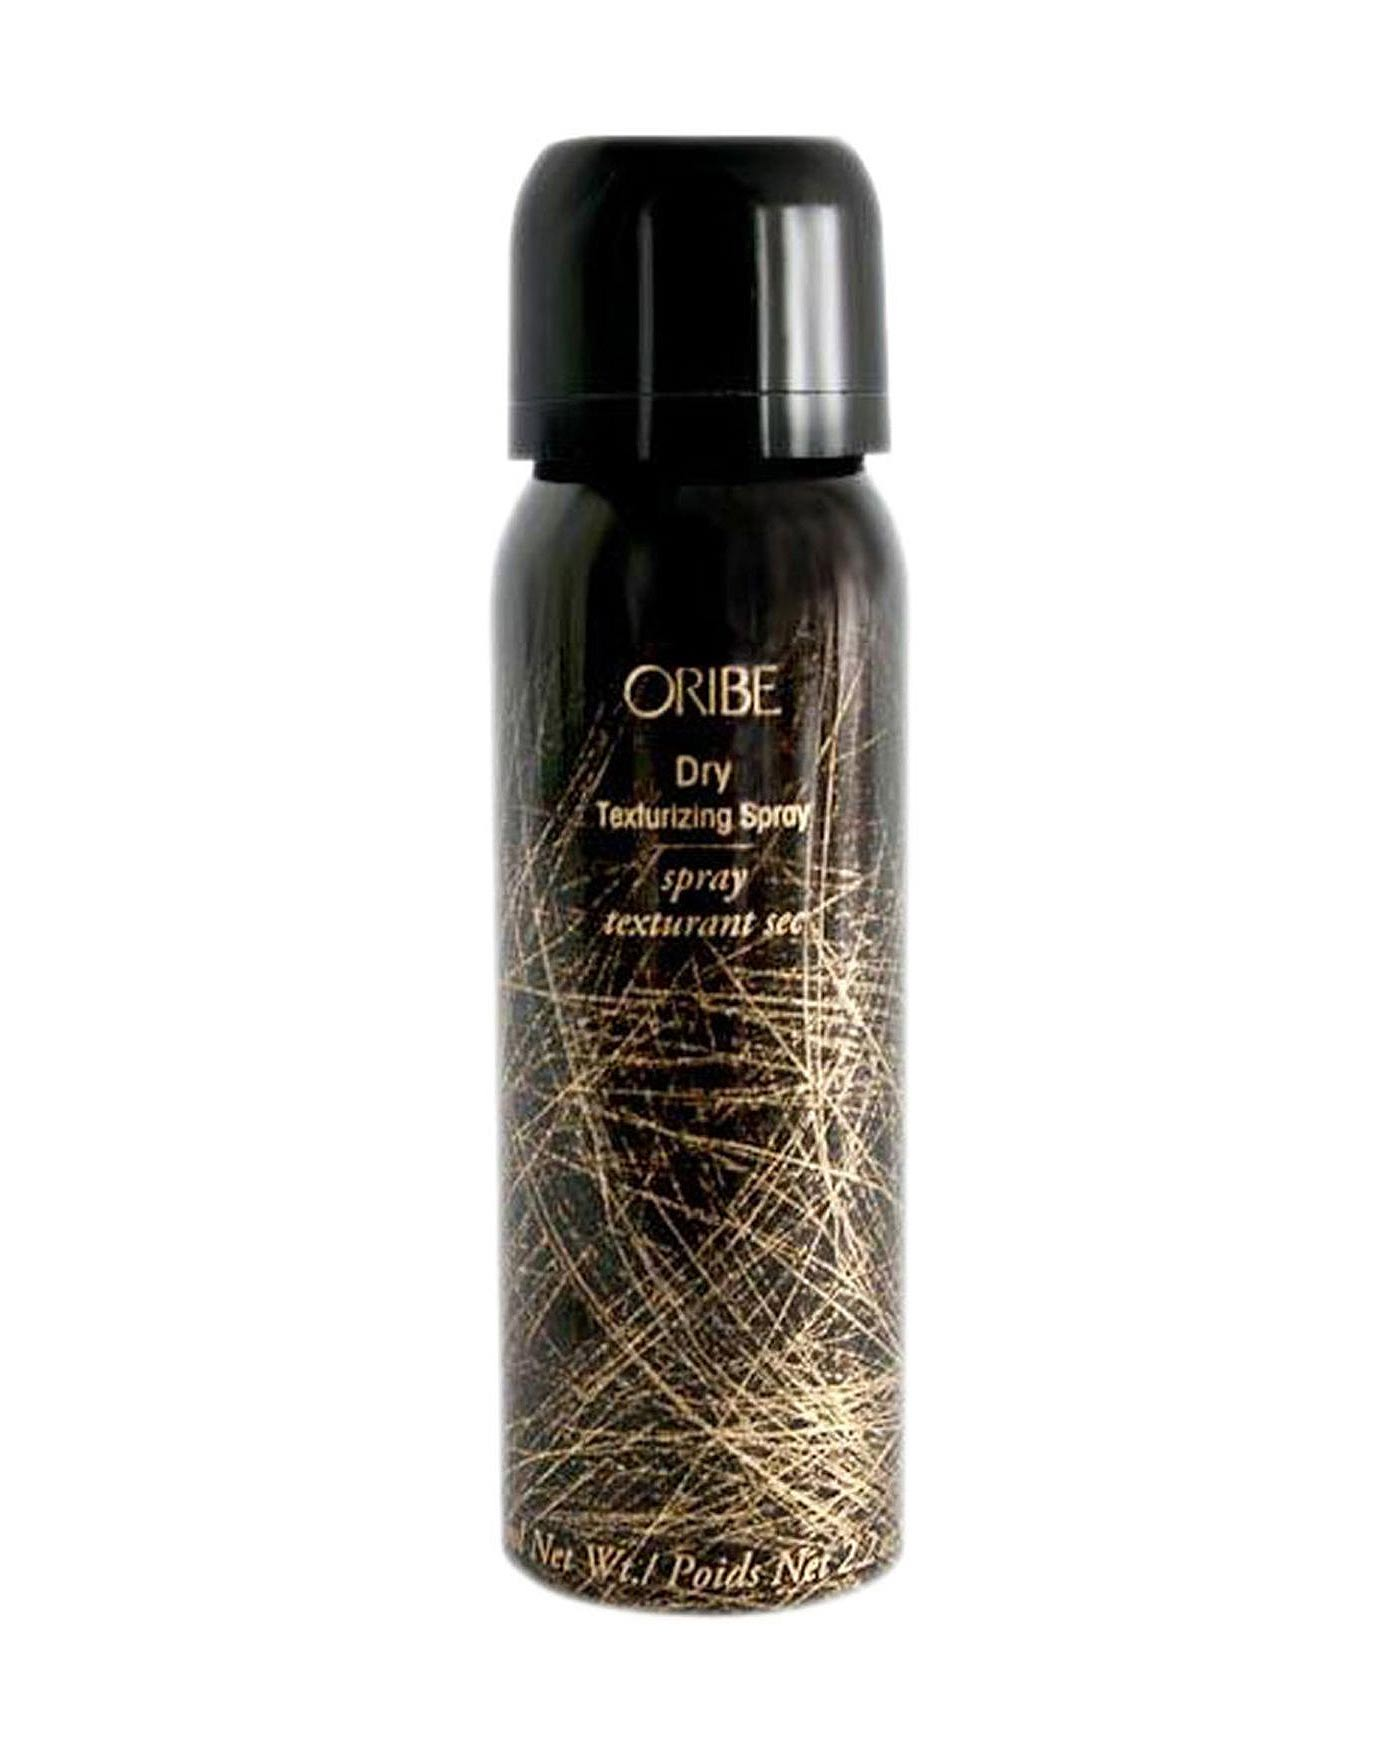 big-day-beauty-awards-oribe-dry-texturizing-spray-0216.jpg